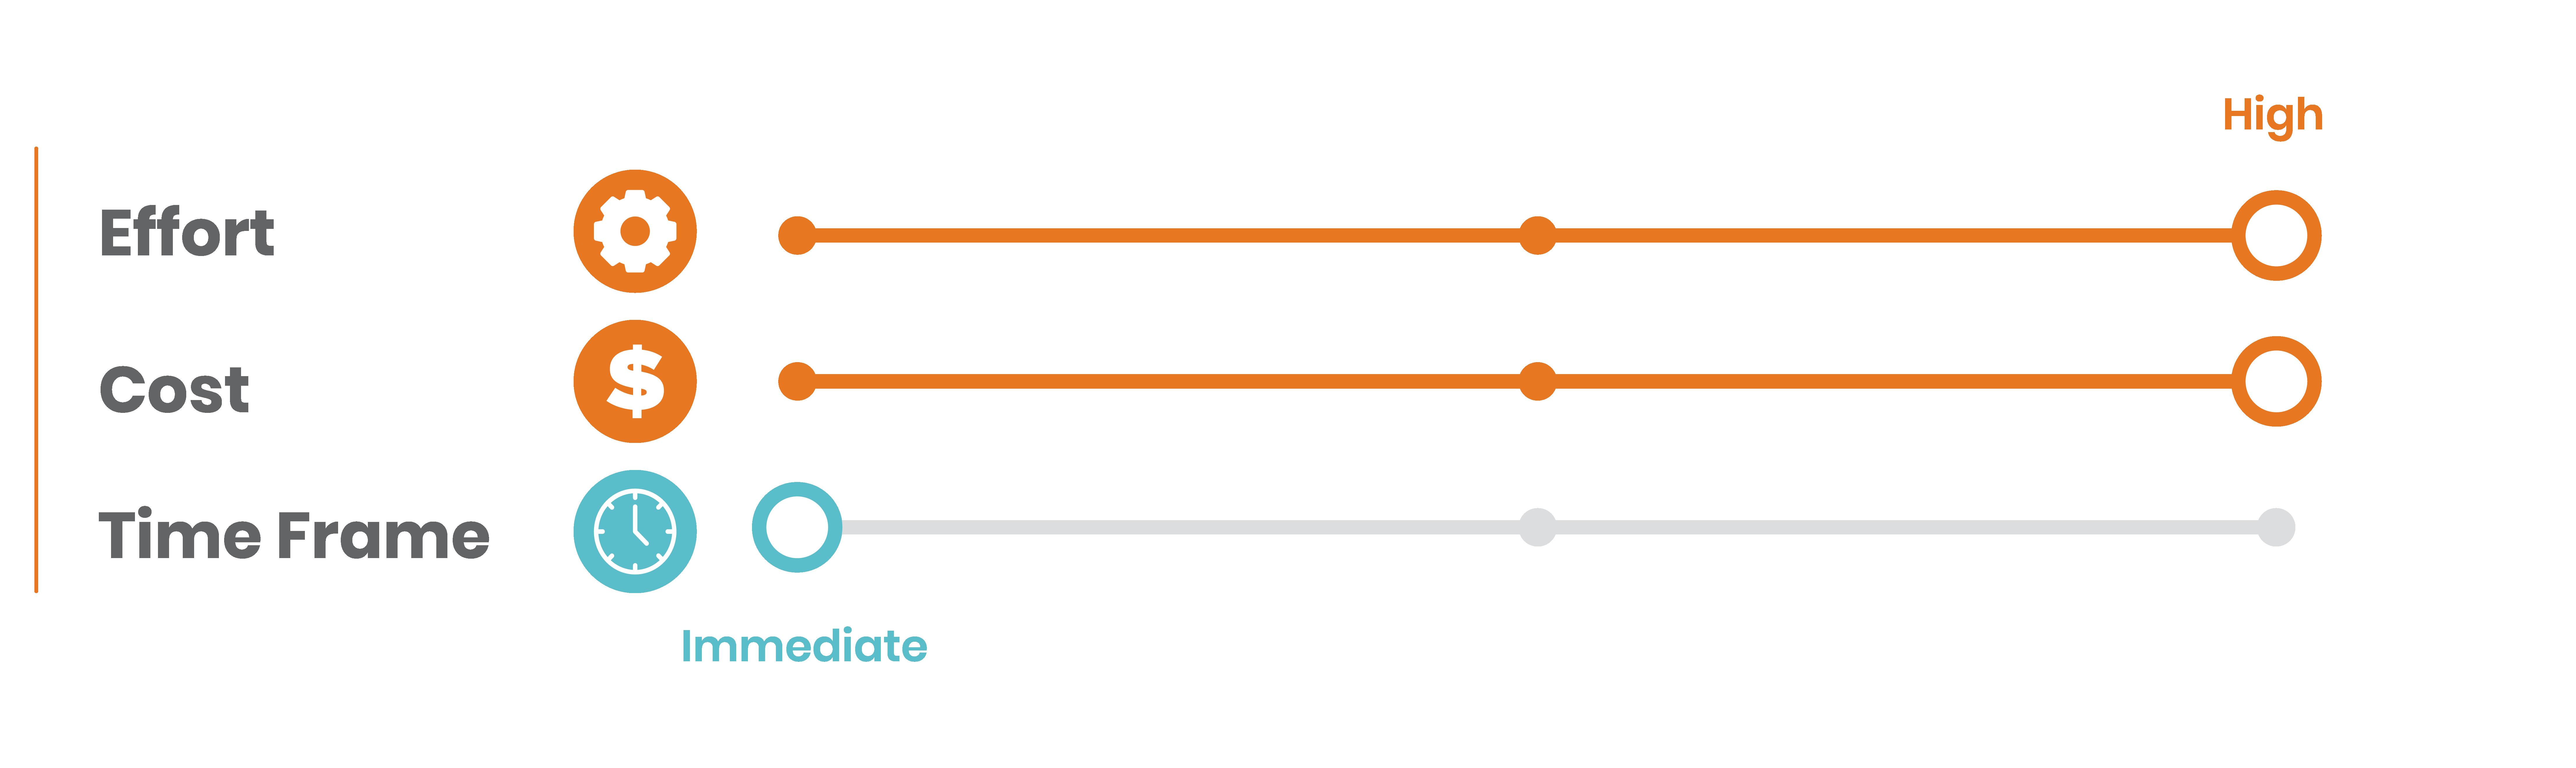 7.Bar side graphic with three metrics effort high risk, cost high risk, time frame medium risk